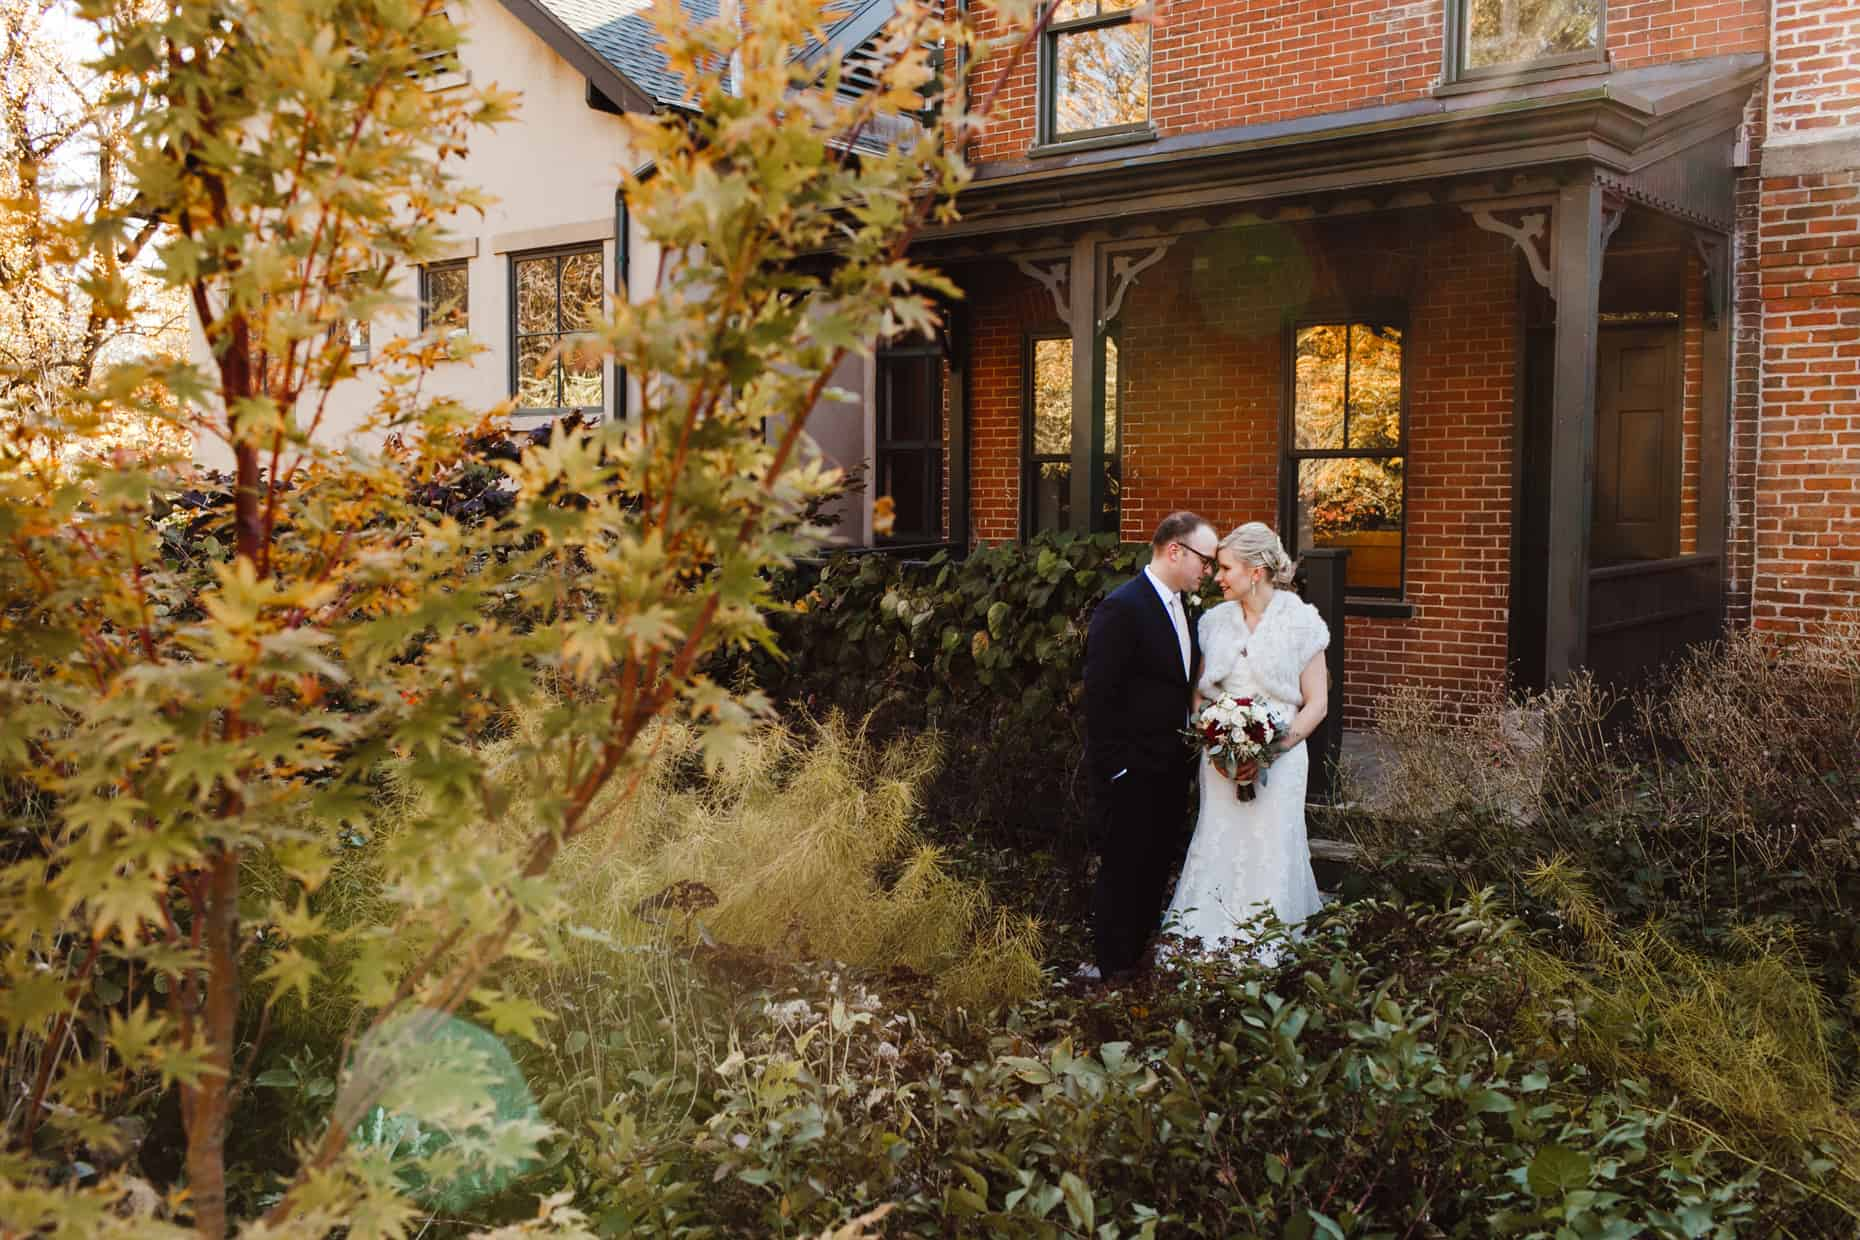 Weddings Delaware Center for Horticulture